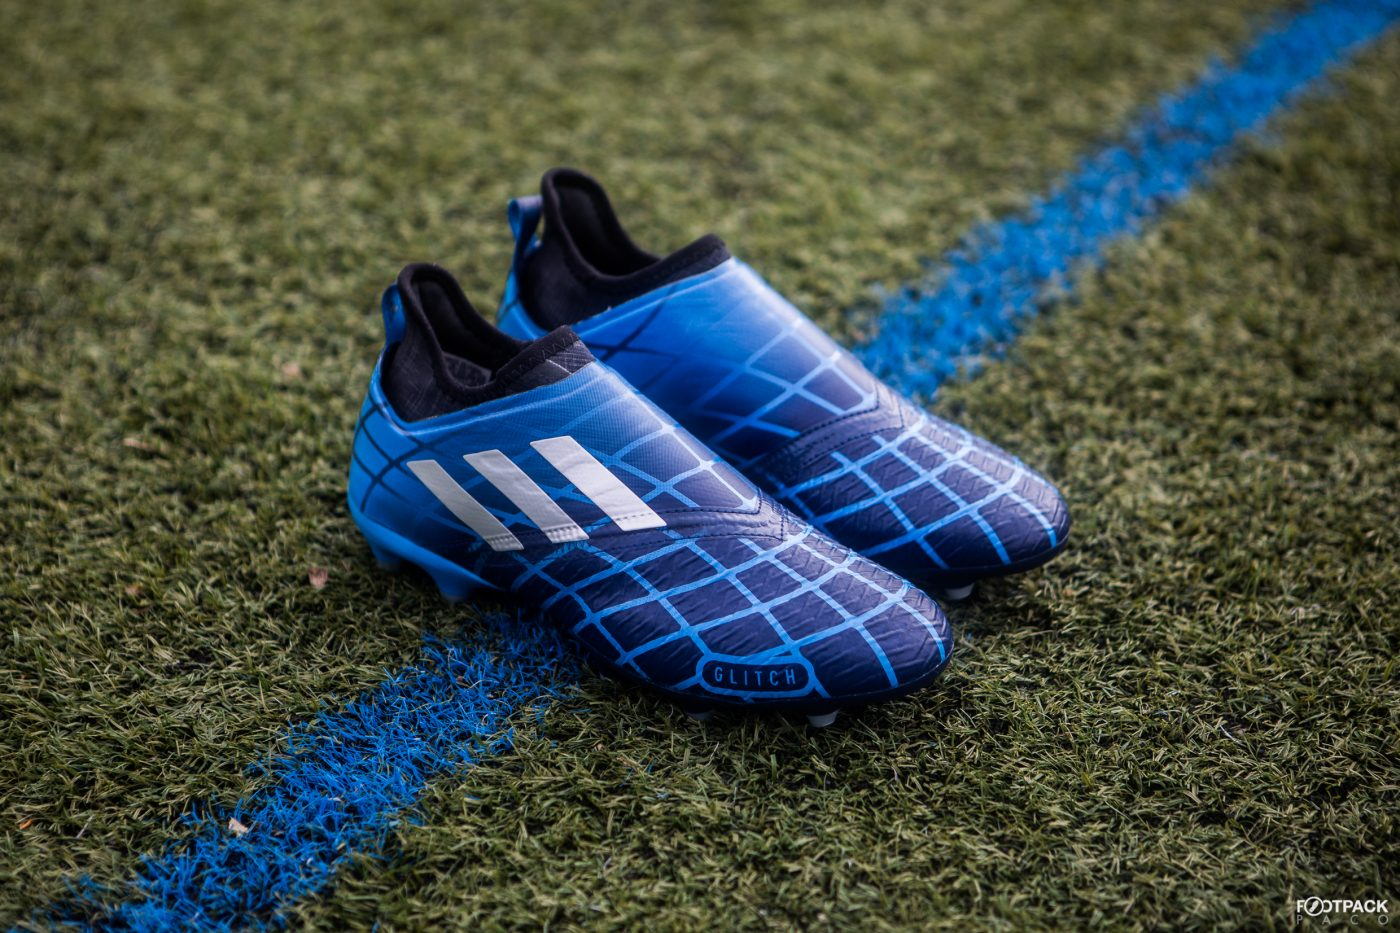 adidas-glitch-classic-pack-skin-F50-araignee-2005-footpack-7